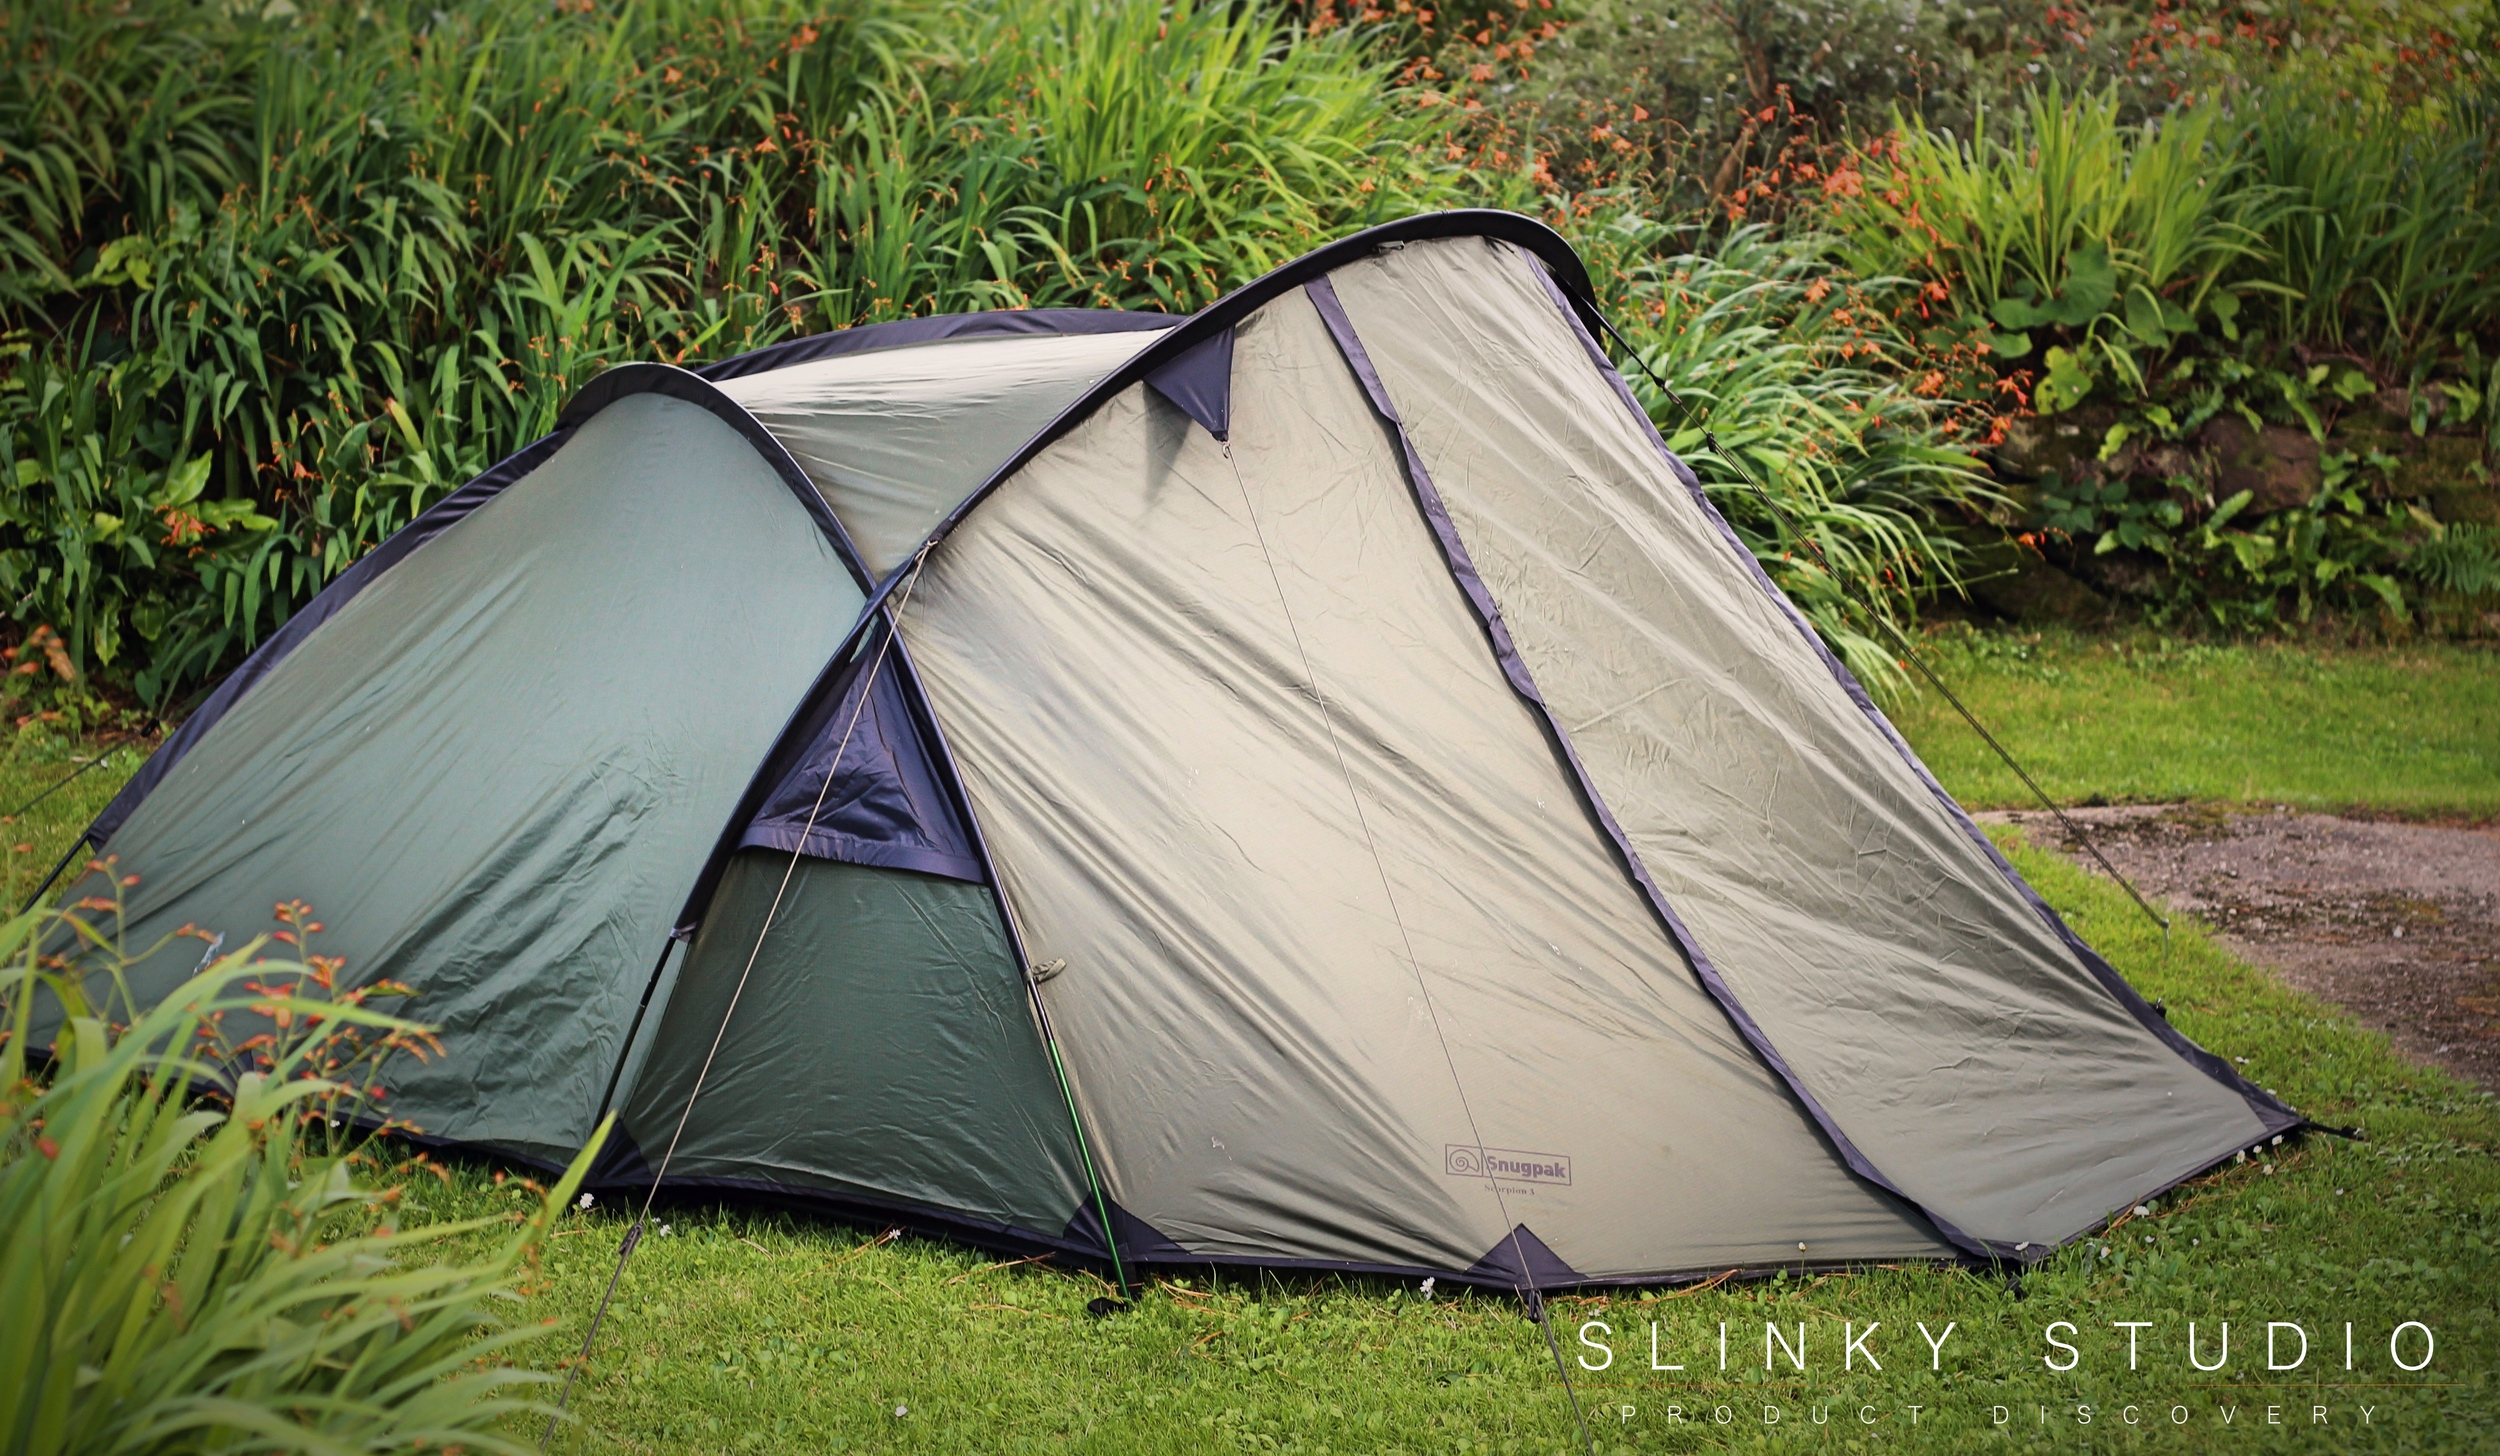 Snugpak Scorpion 3 Tent Side View.jpg